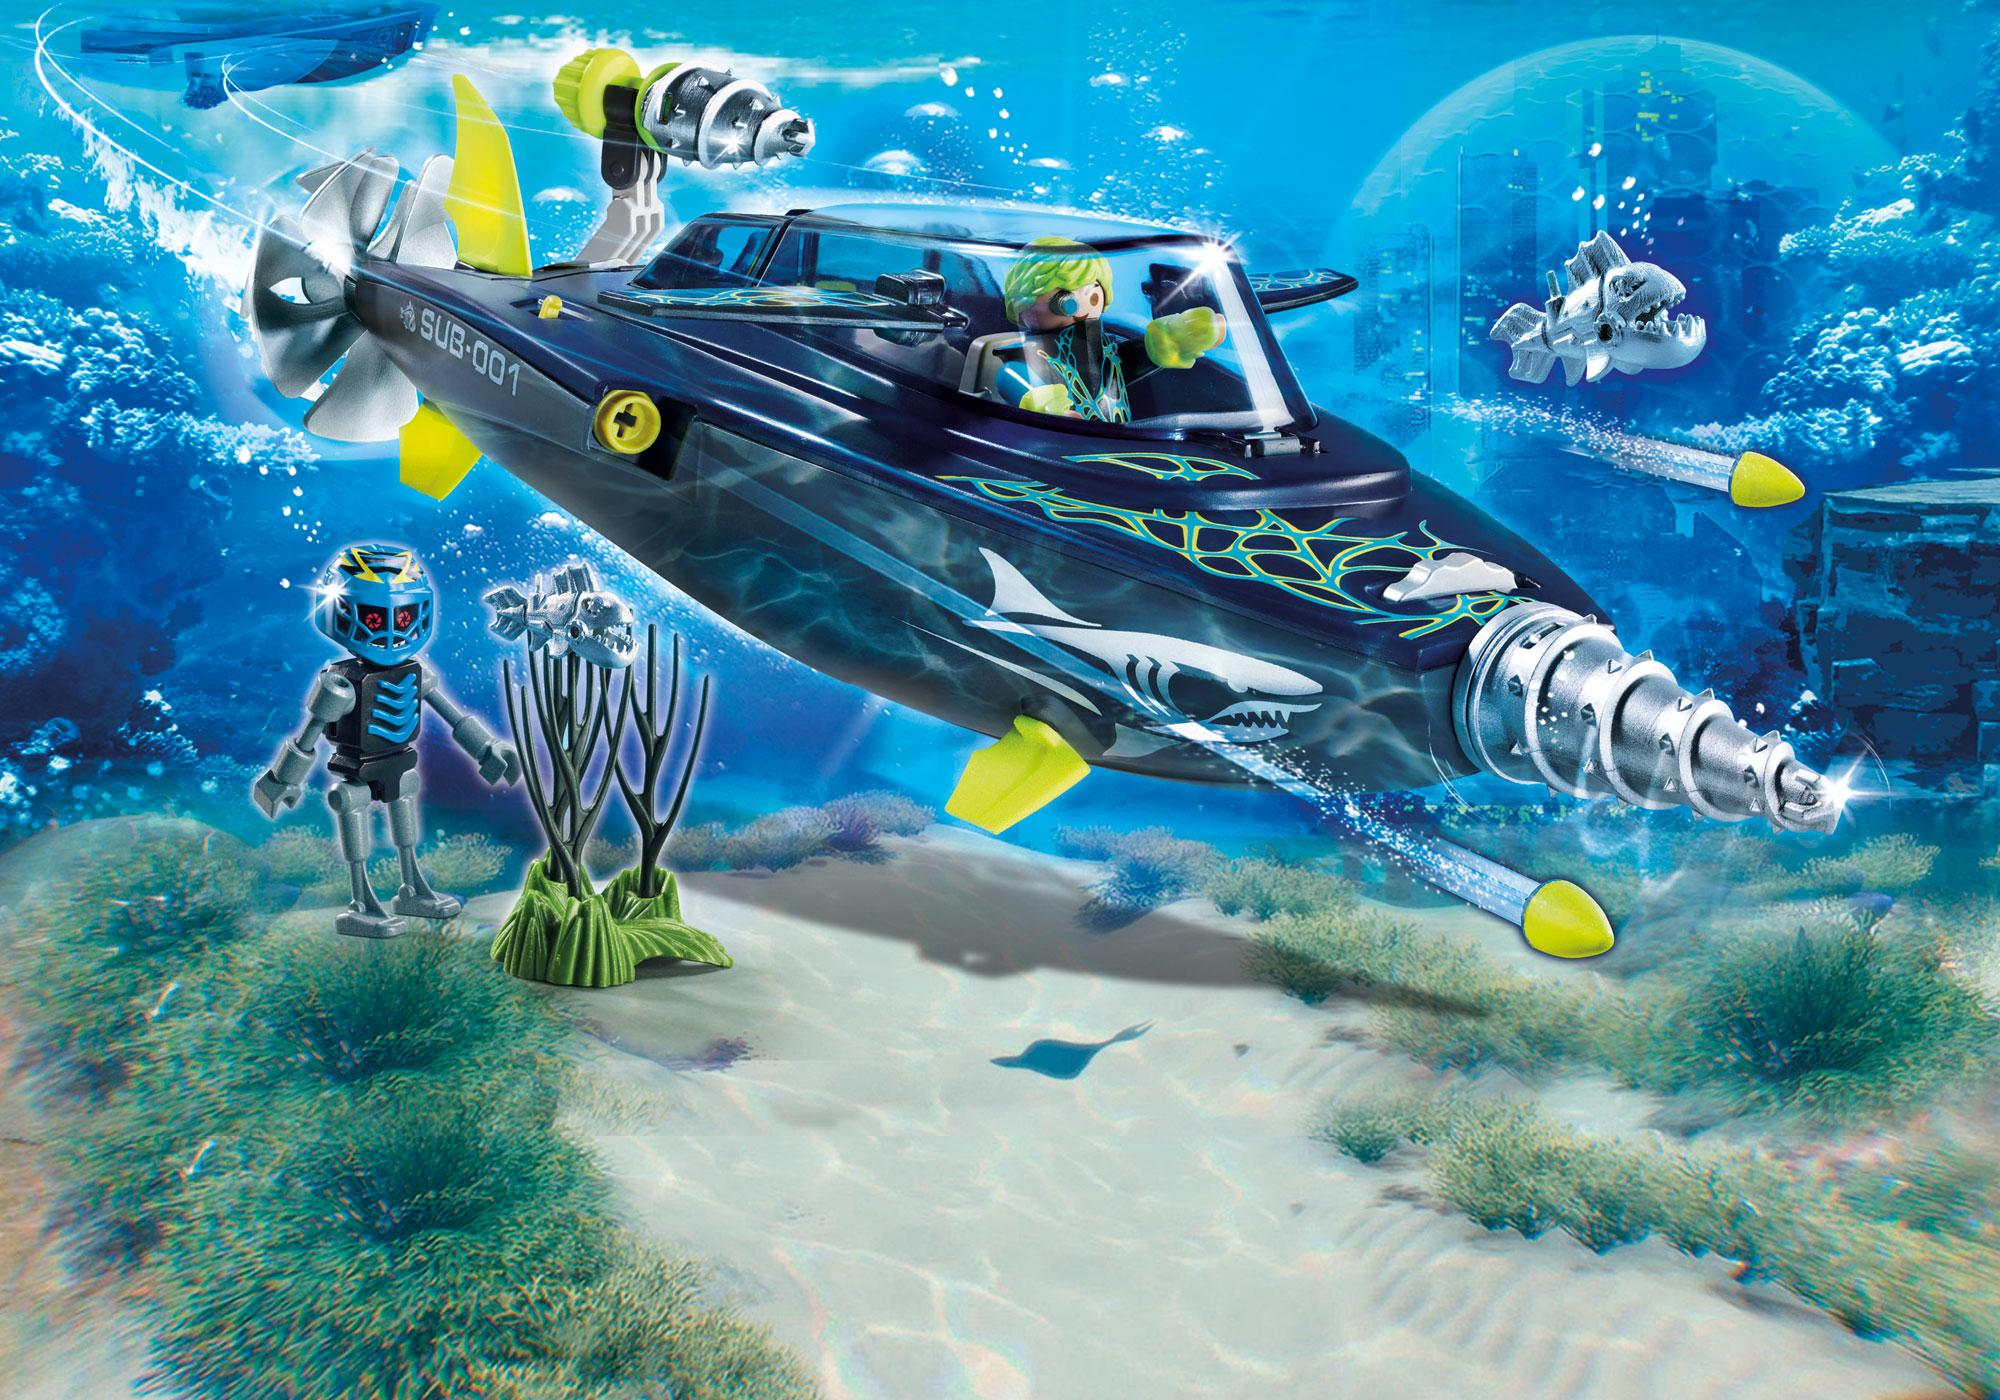 http://media.playmobil.com/i/playmobil/70005_product_detail/TEAM S.H.A.R.K. Destroyer med bor